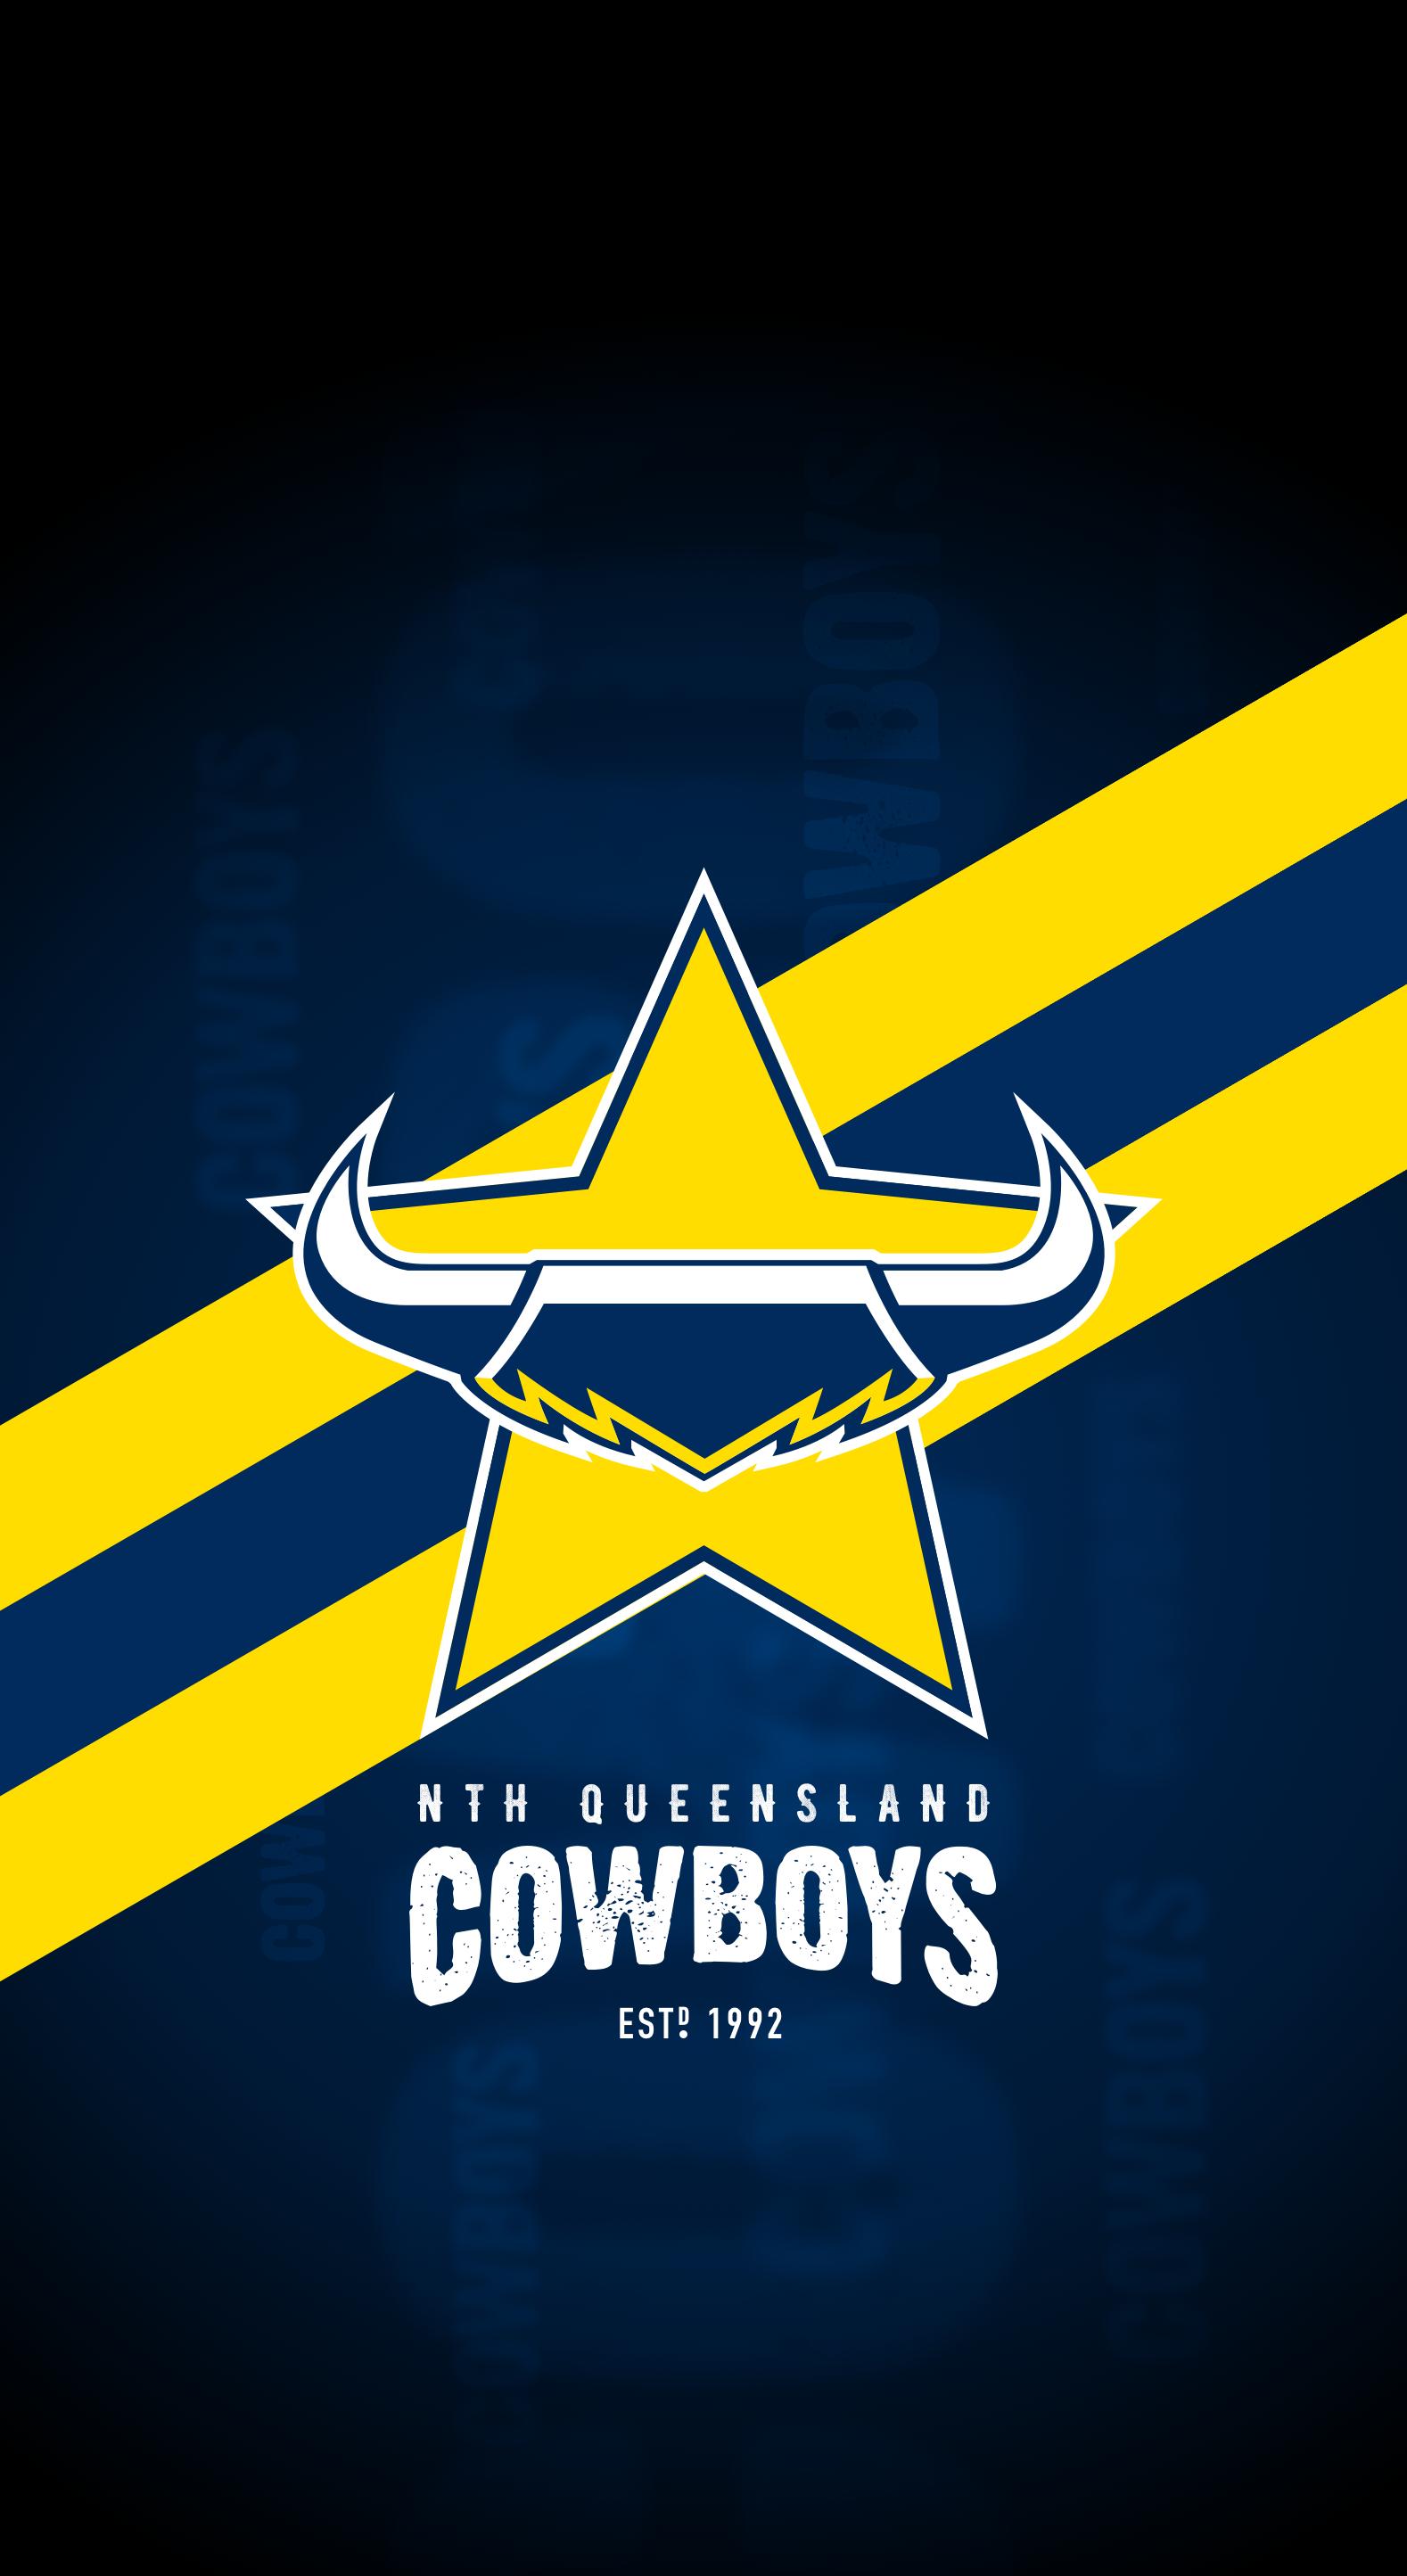 North Queensland Cowboys iPhone X Lock Screen Wallpaper